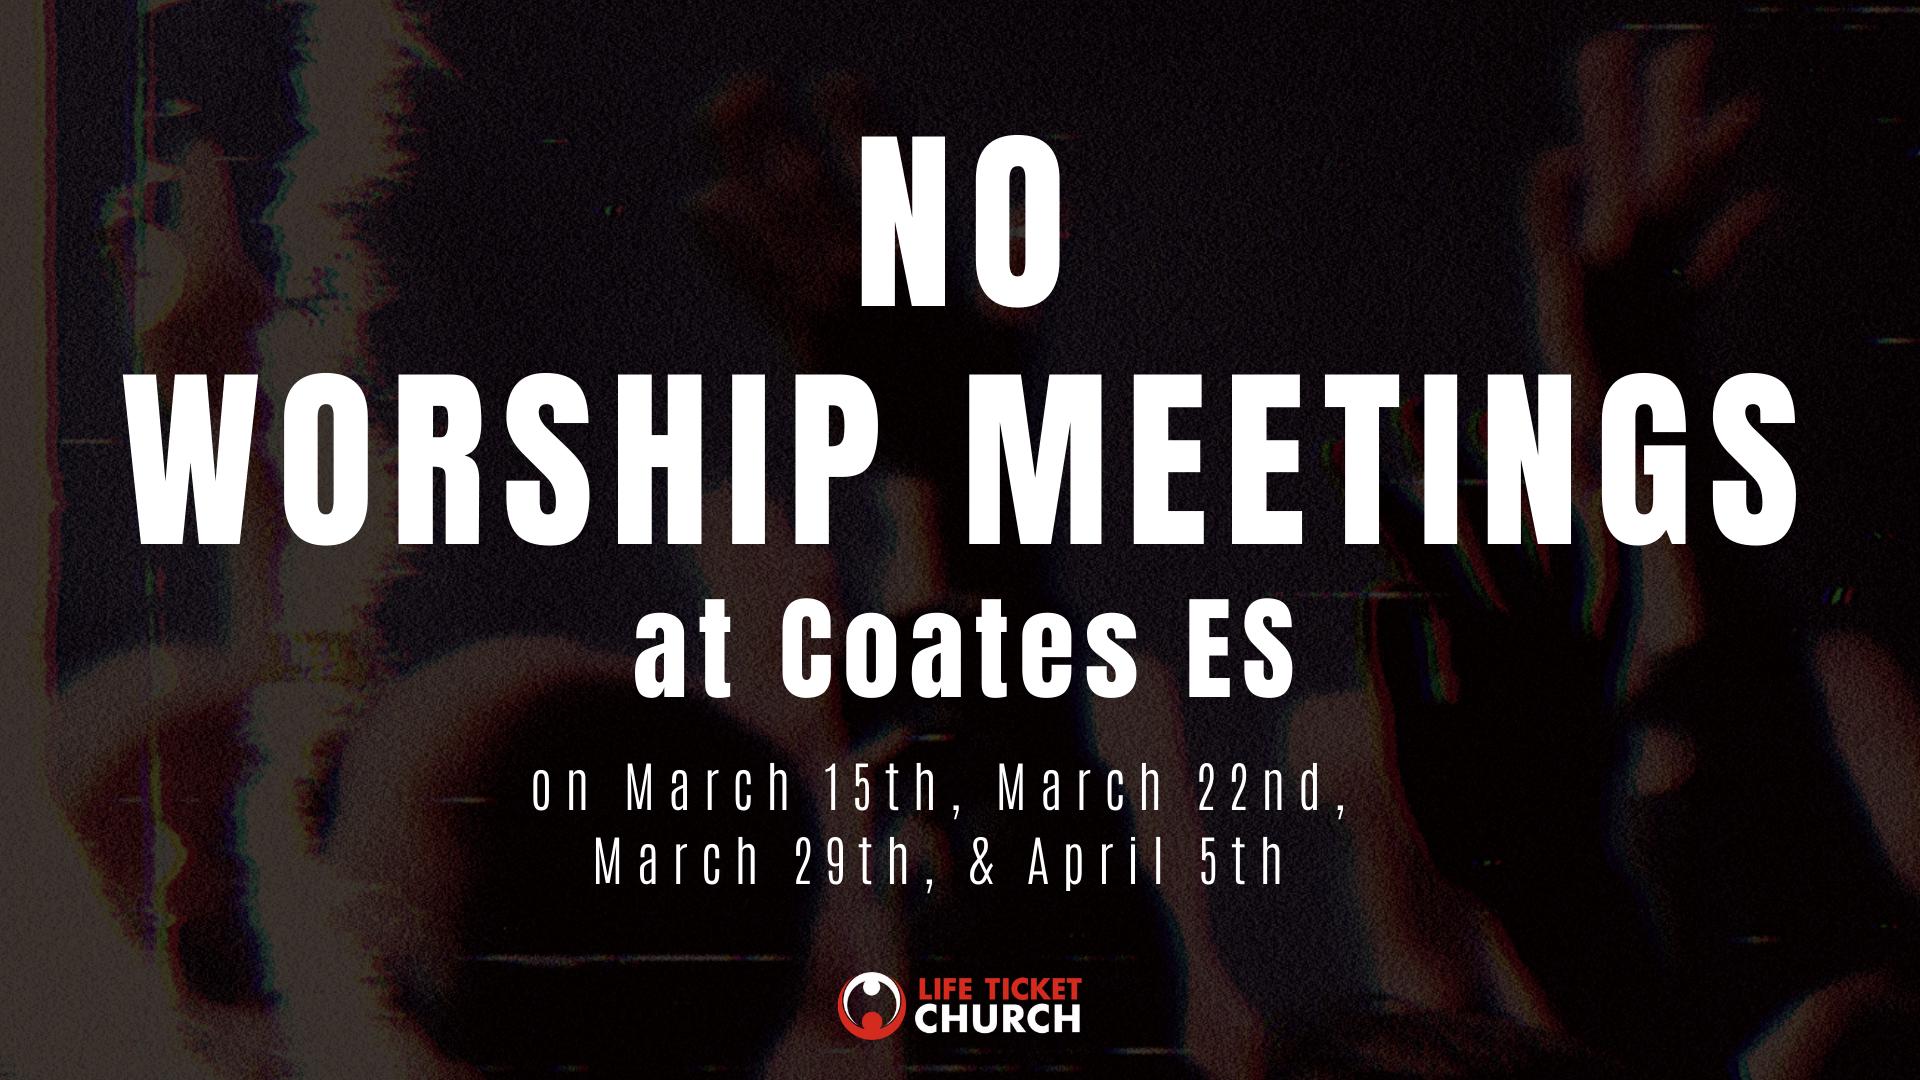 No Worship Meeting1_Web_Mar15 (1)